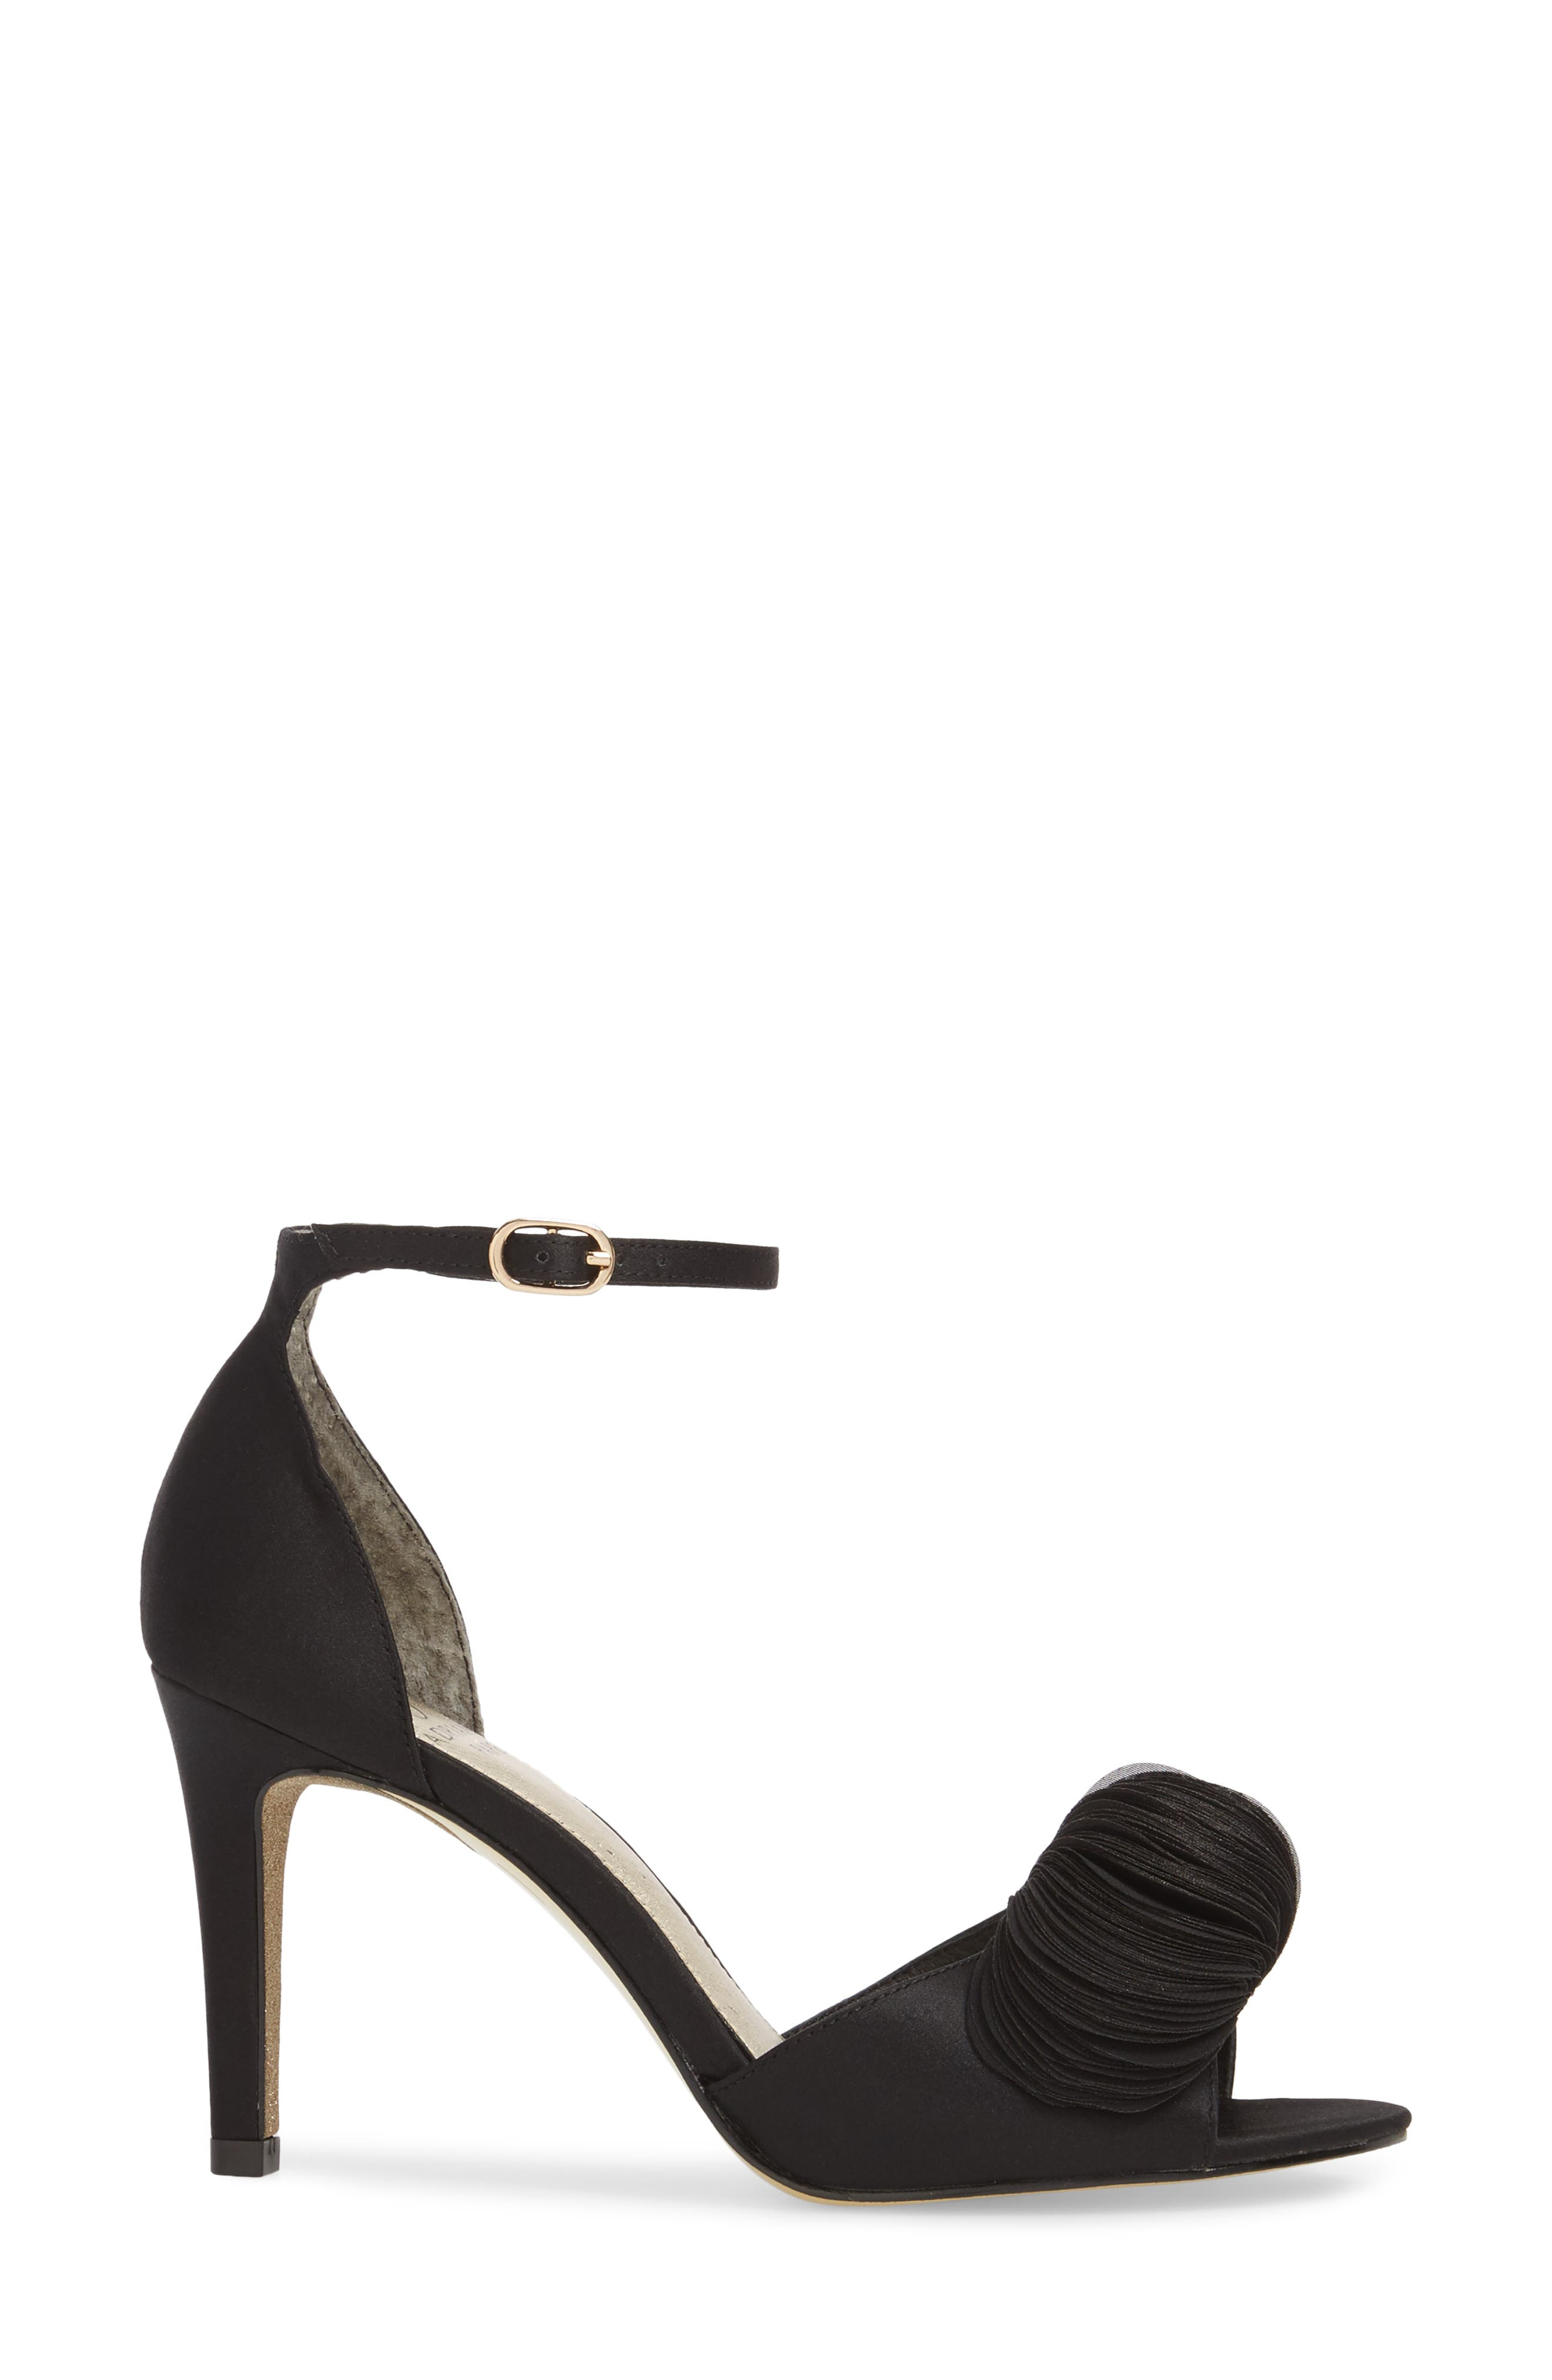 Gracie Ankle Strap Sandal,                             Alternate thumbnail 3, color,                             BLACK FABRIC